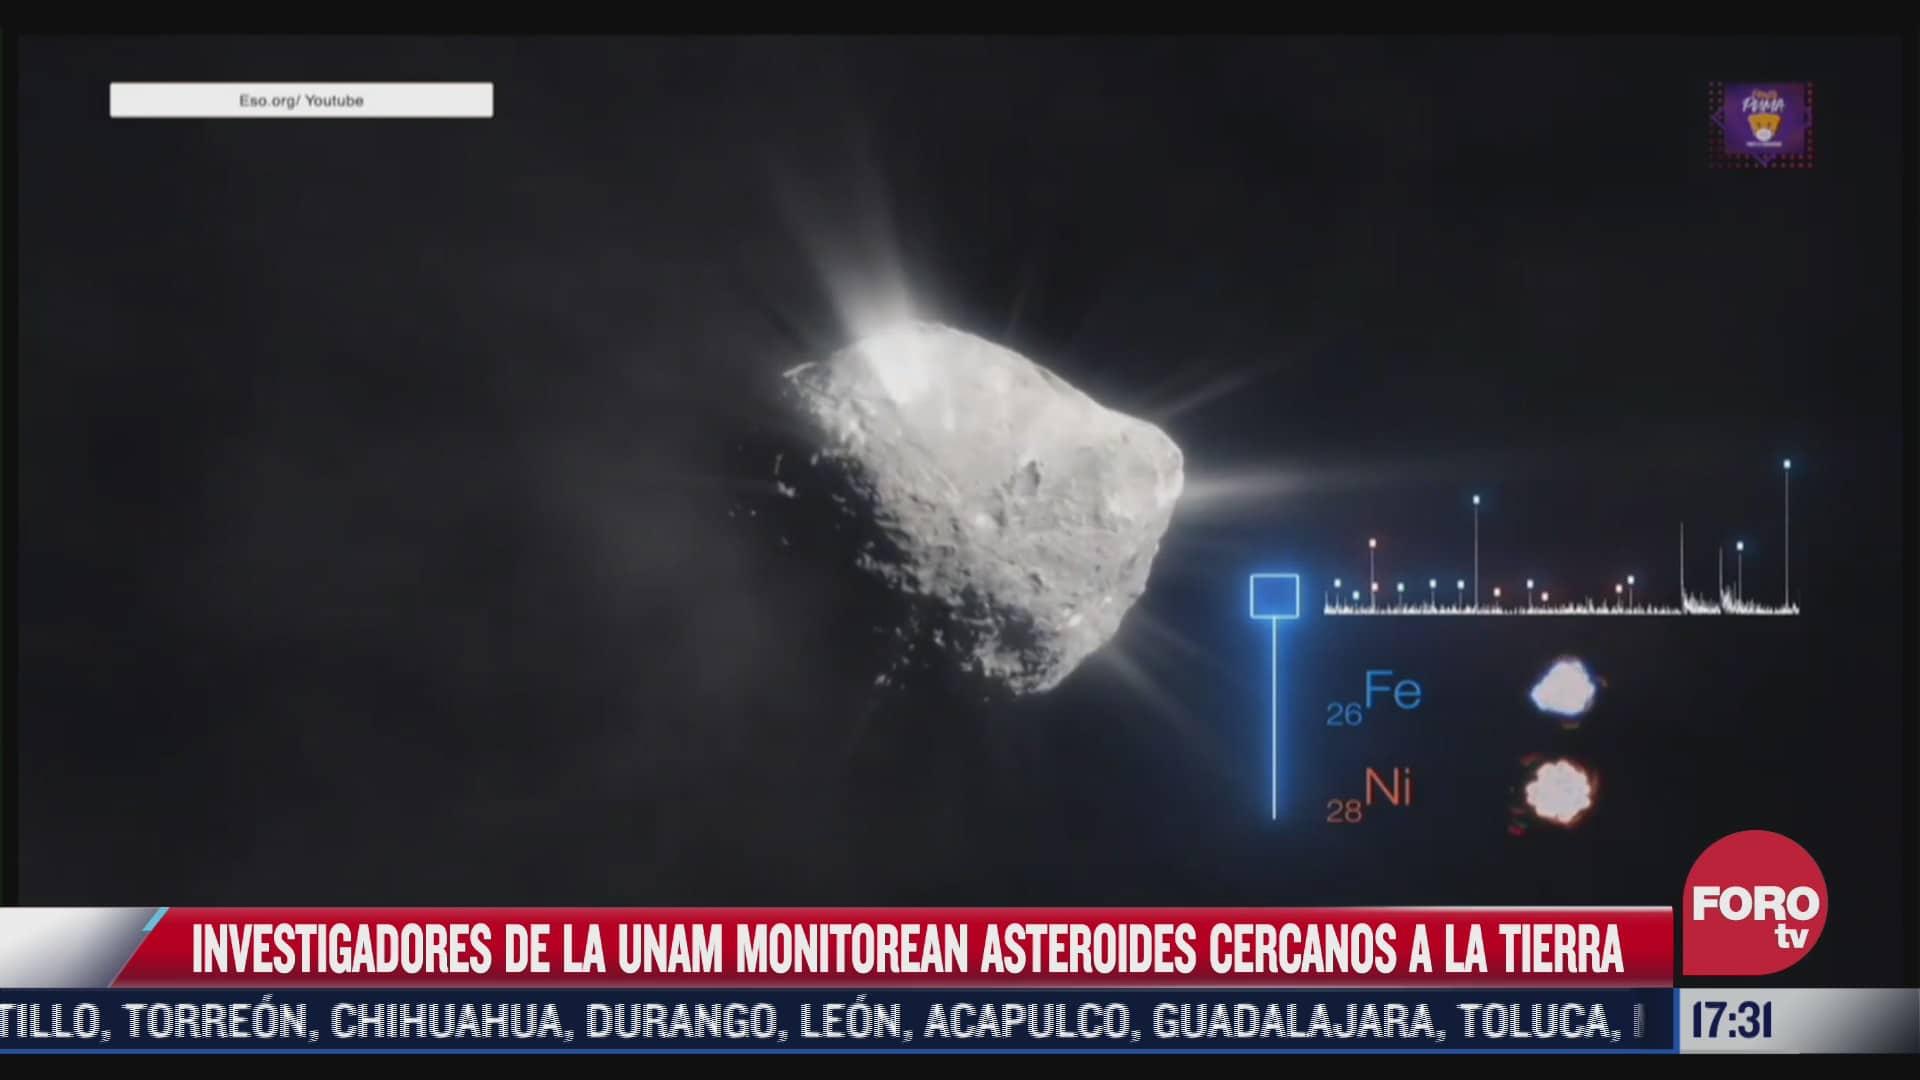 unam monitorea asteroides cercanos a la tierra